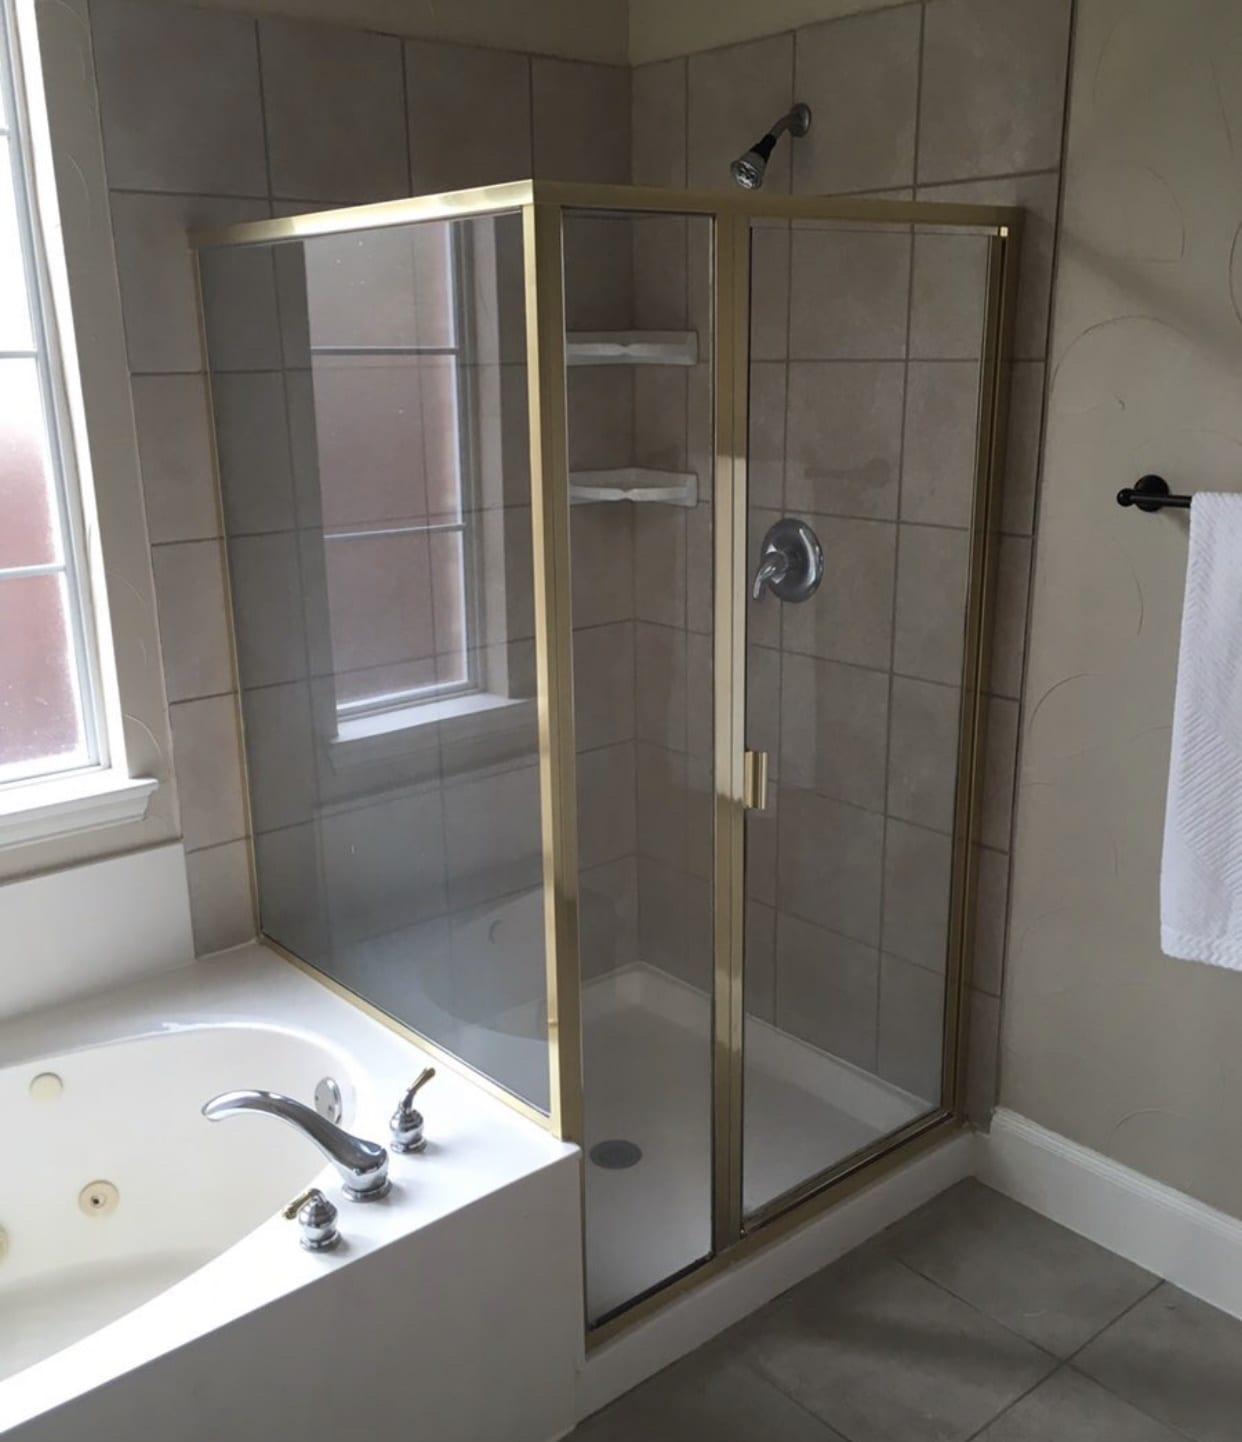 frameless shower doors img 2161 custom bathroom mirrors and decorative glass from Shower Doors of Nashville